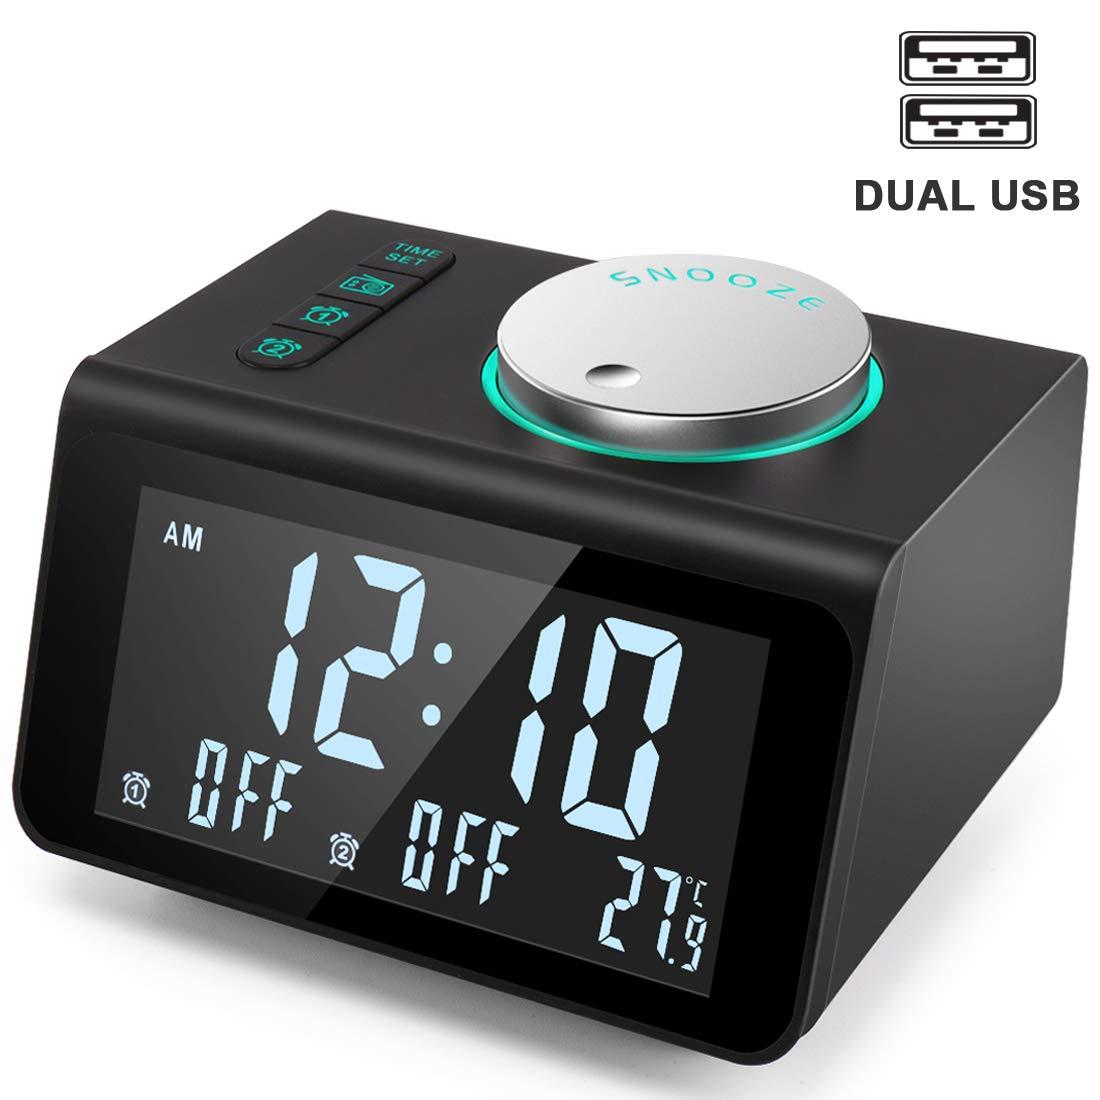 Top 9 Best Sounding Clock Radio On The Market - Buyer's Guide 37